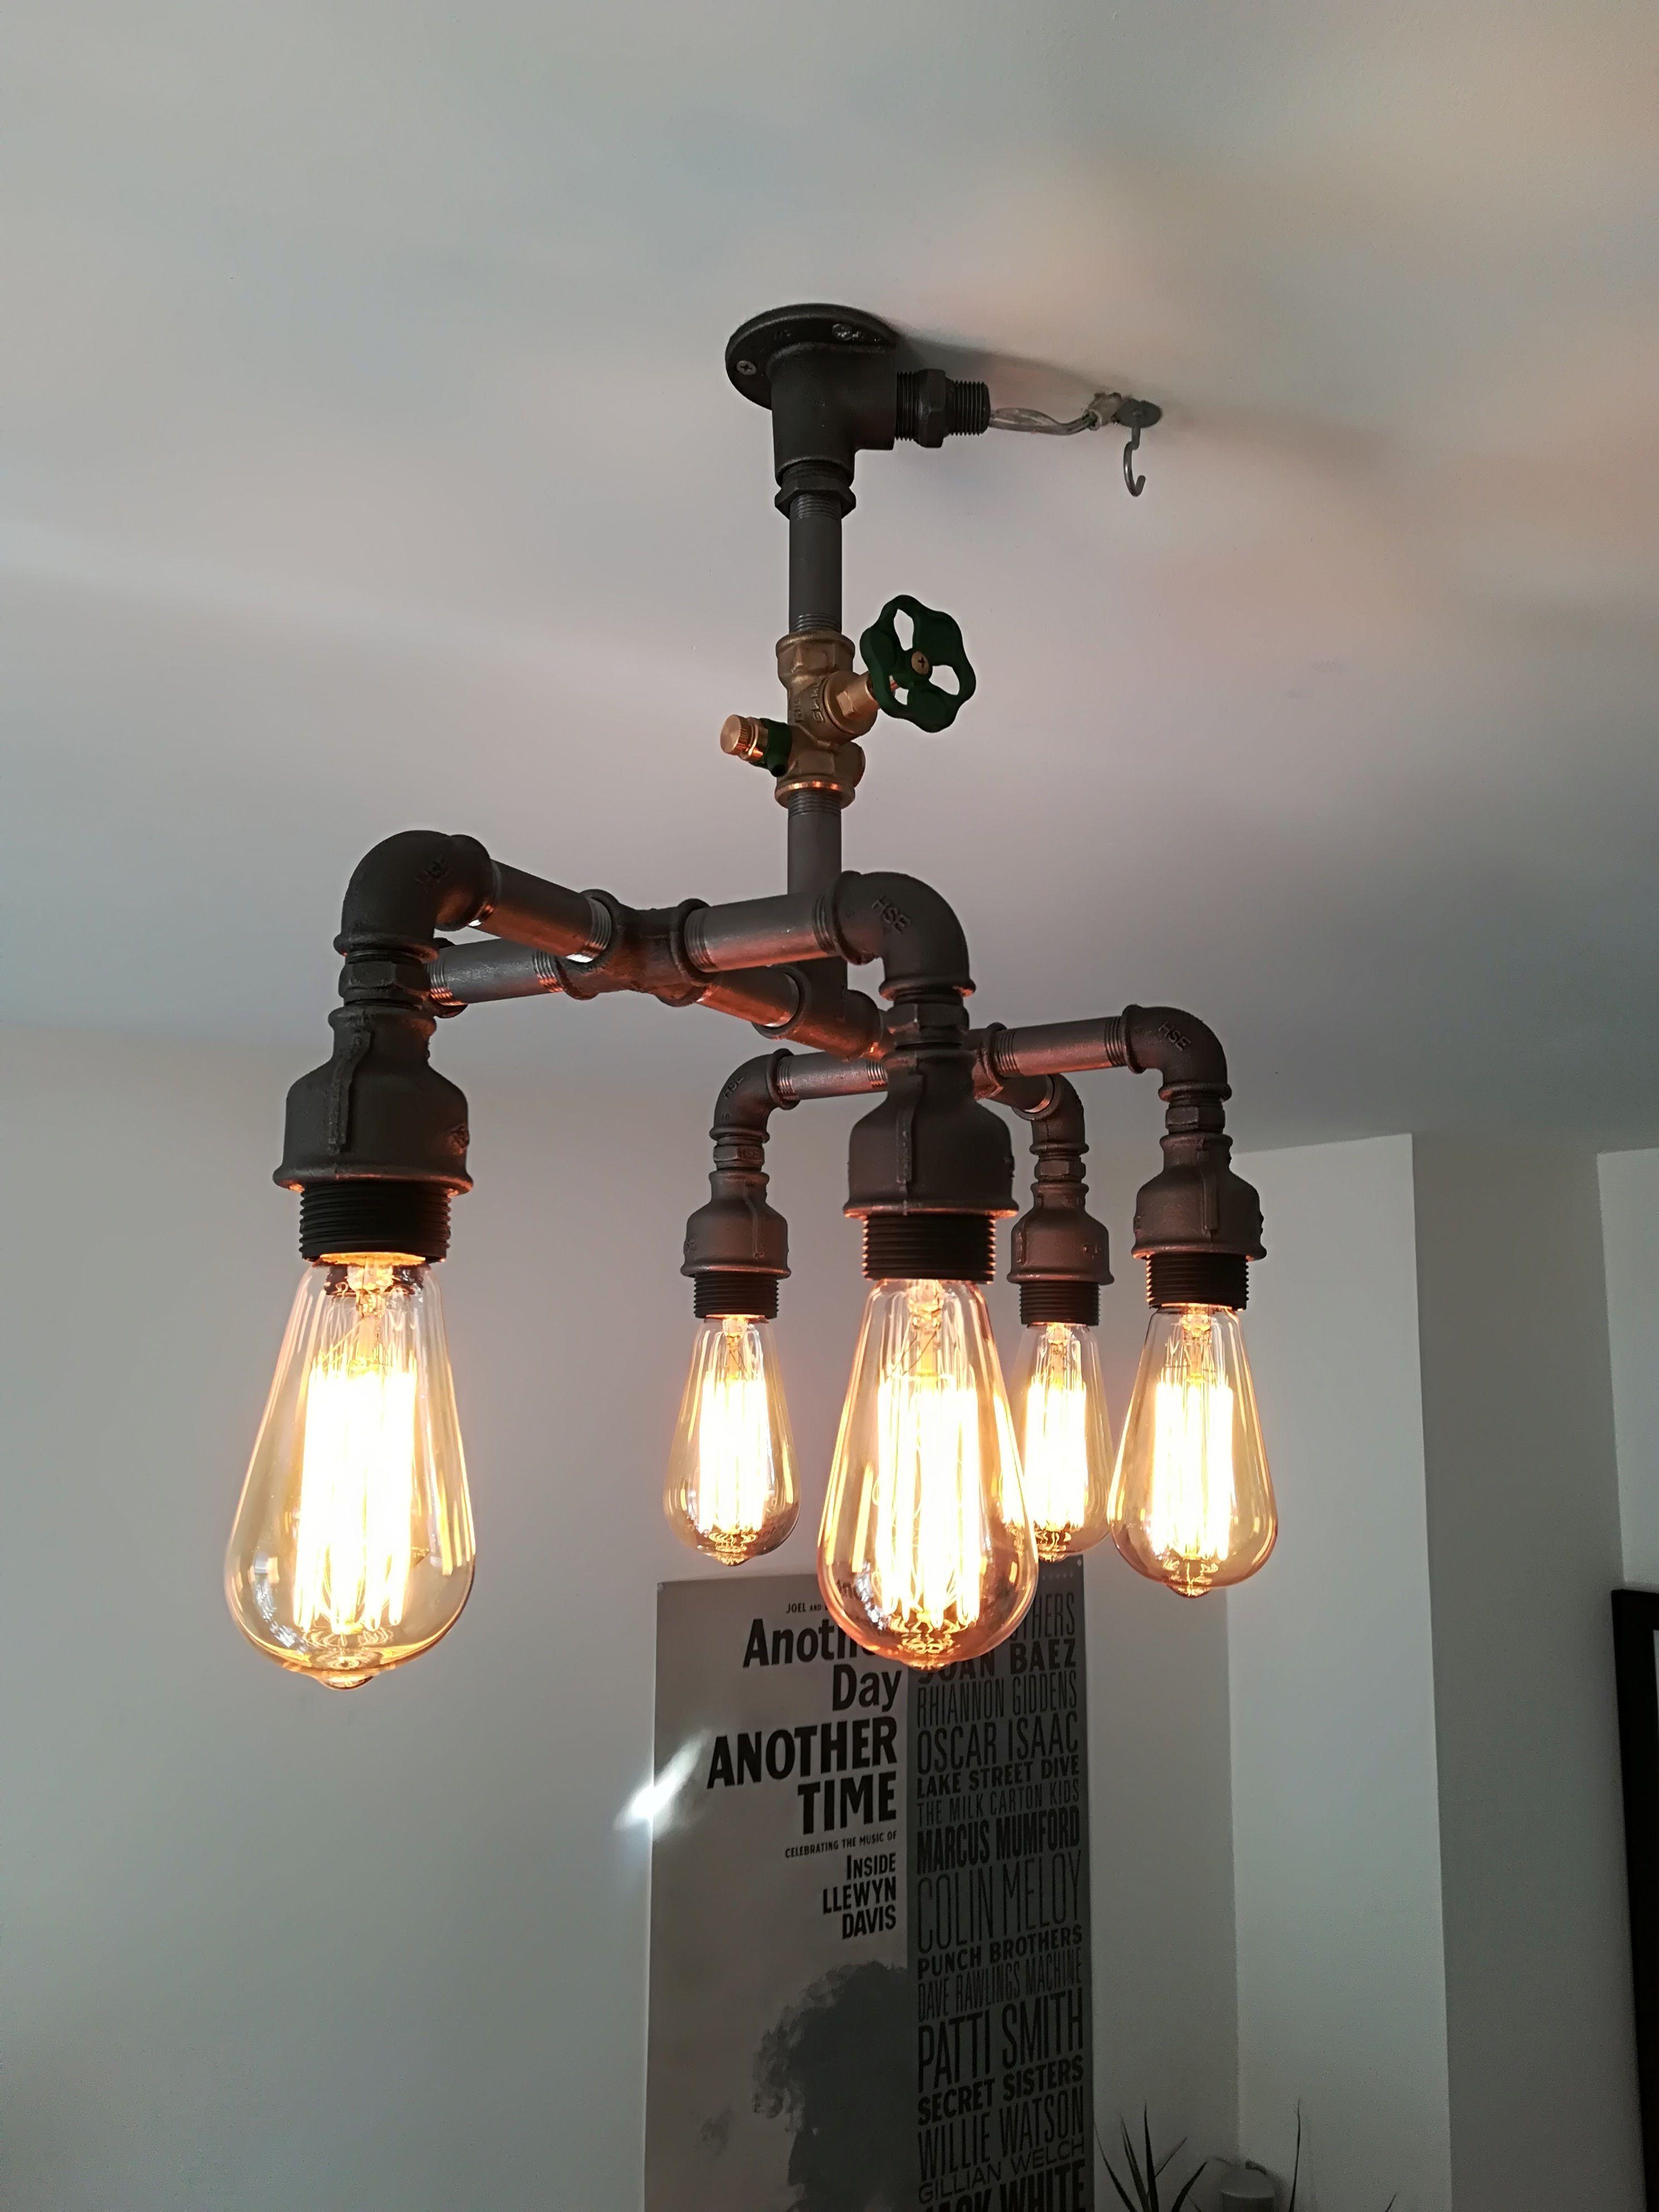 Deckenleuchter 6 Fach Ceiling Lamp 6x Ceiling Lamp Lamp Steampunk Lamp